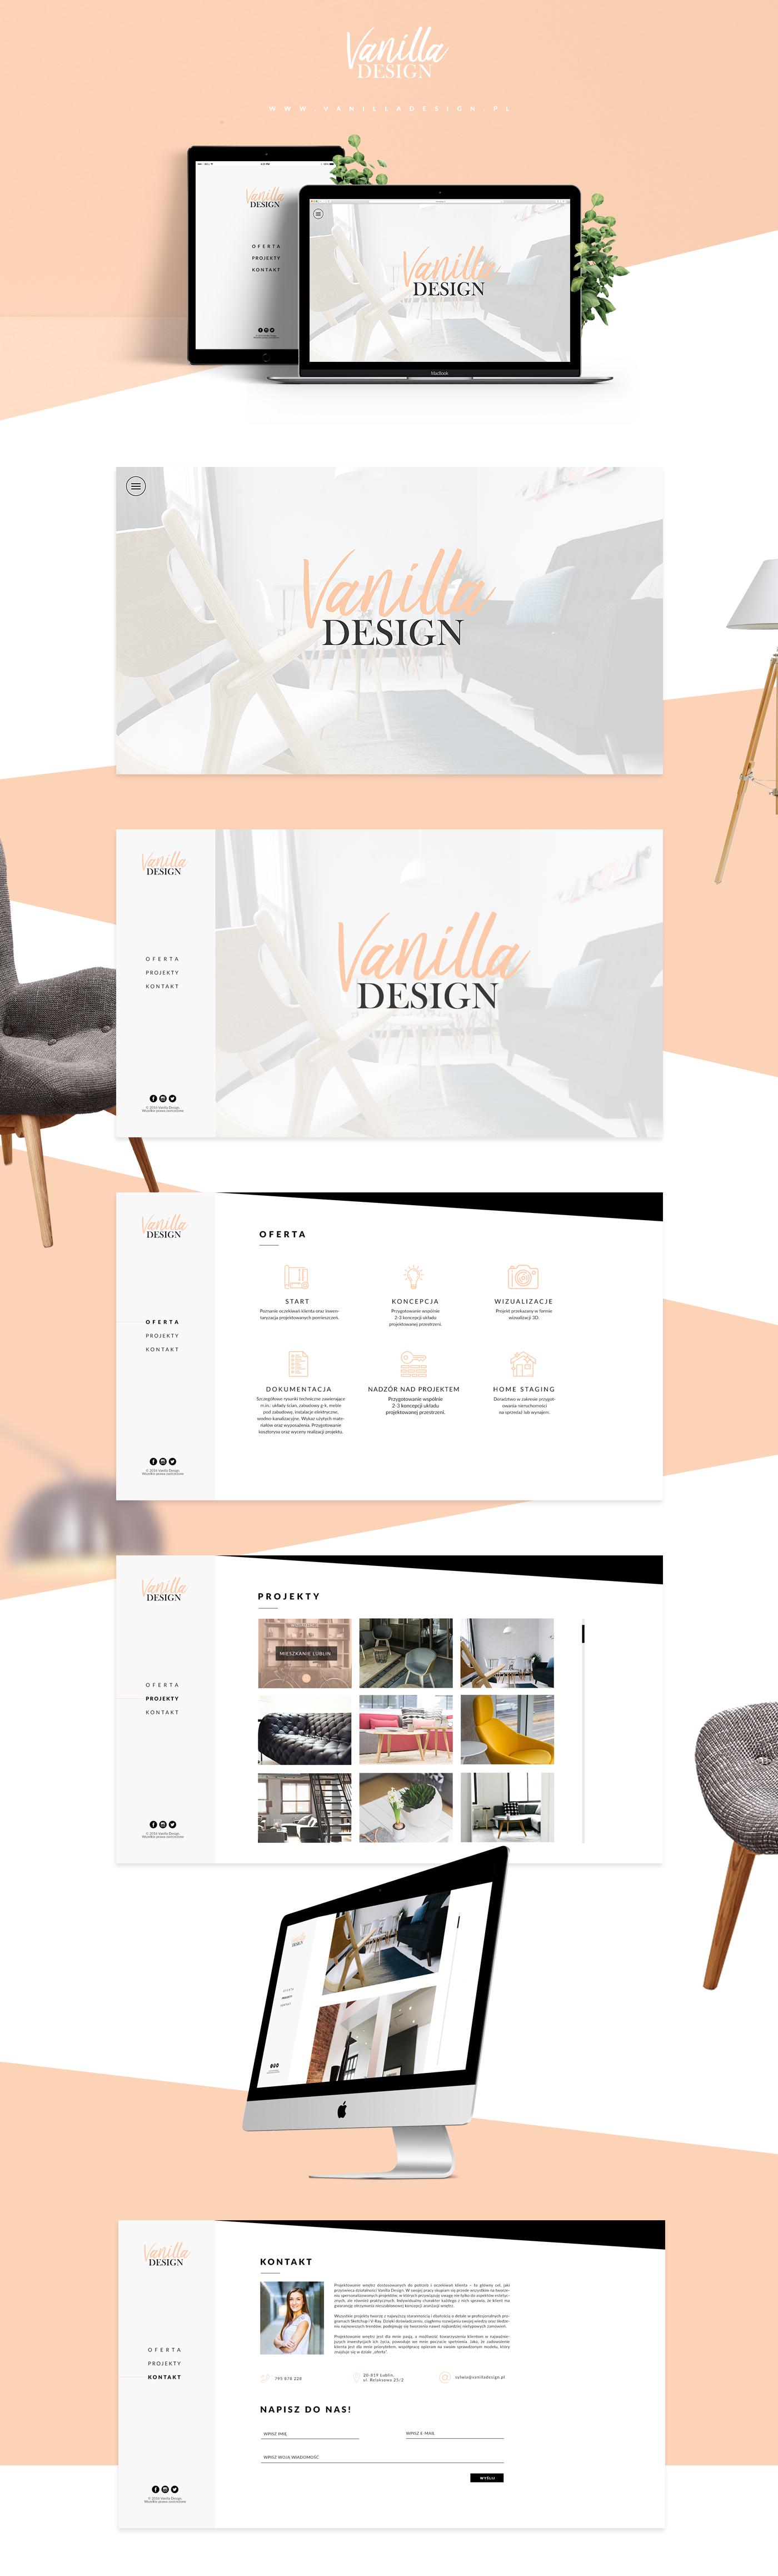 Vanilla Design Website On Behance